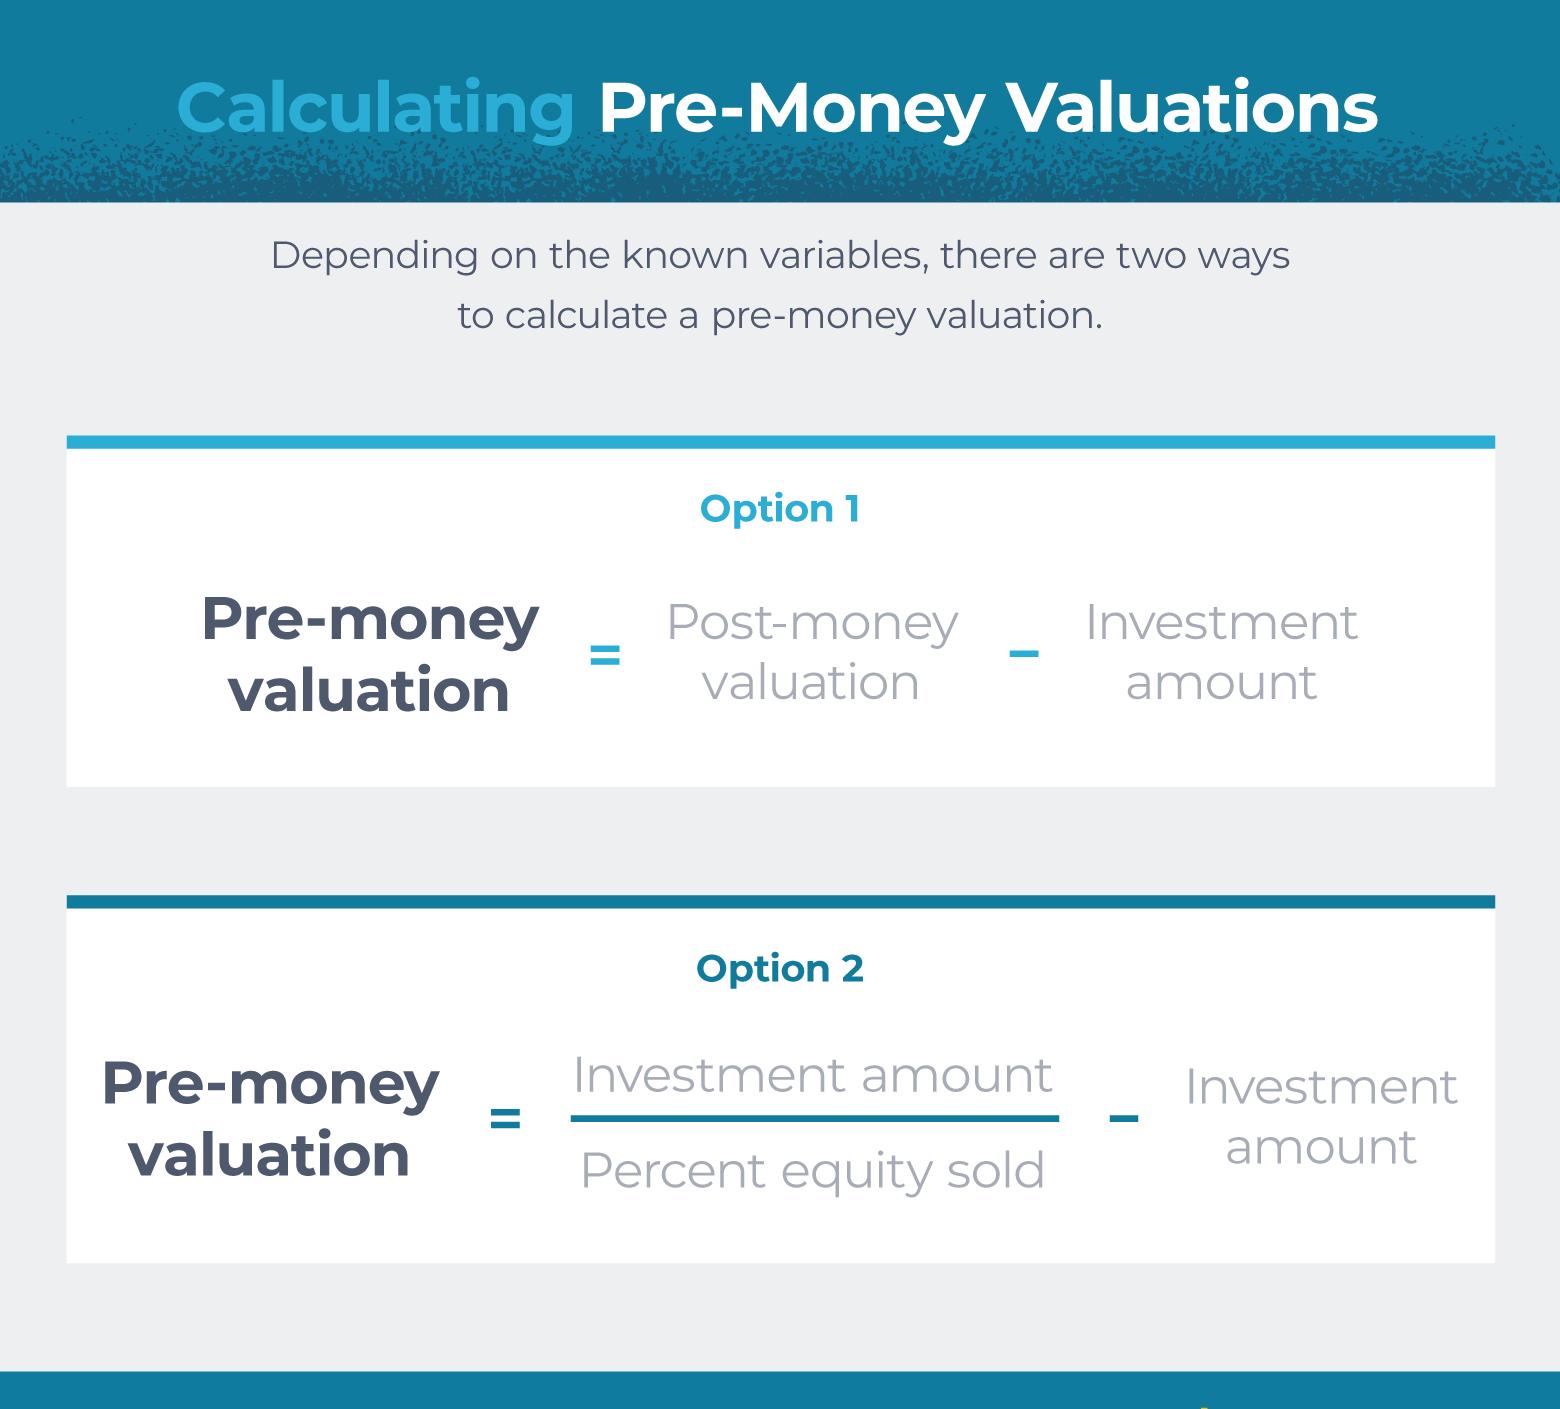 formulas for calculating a pre-money valuation